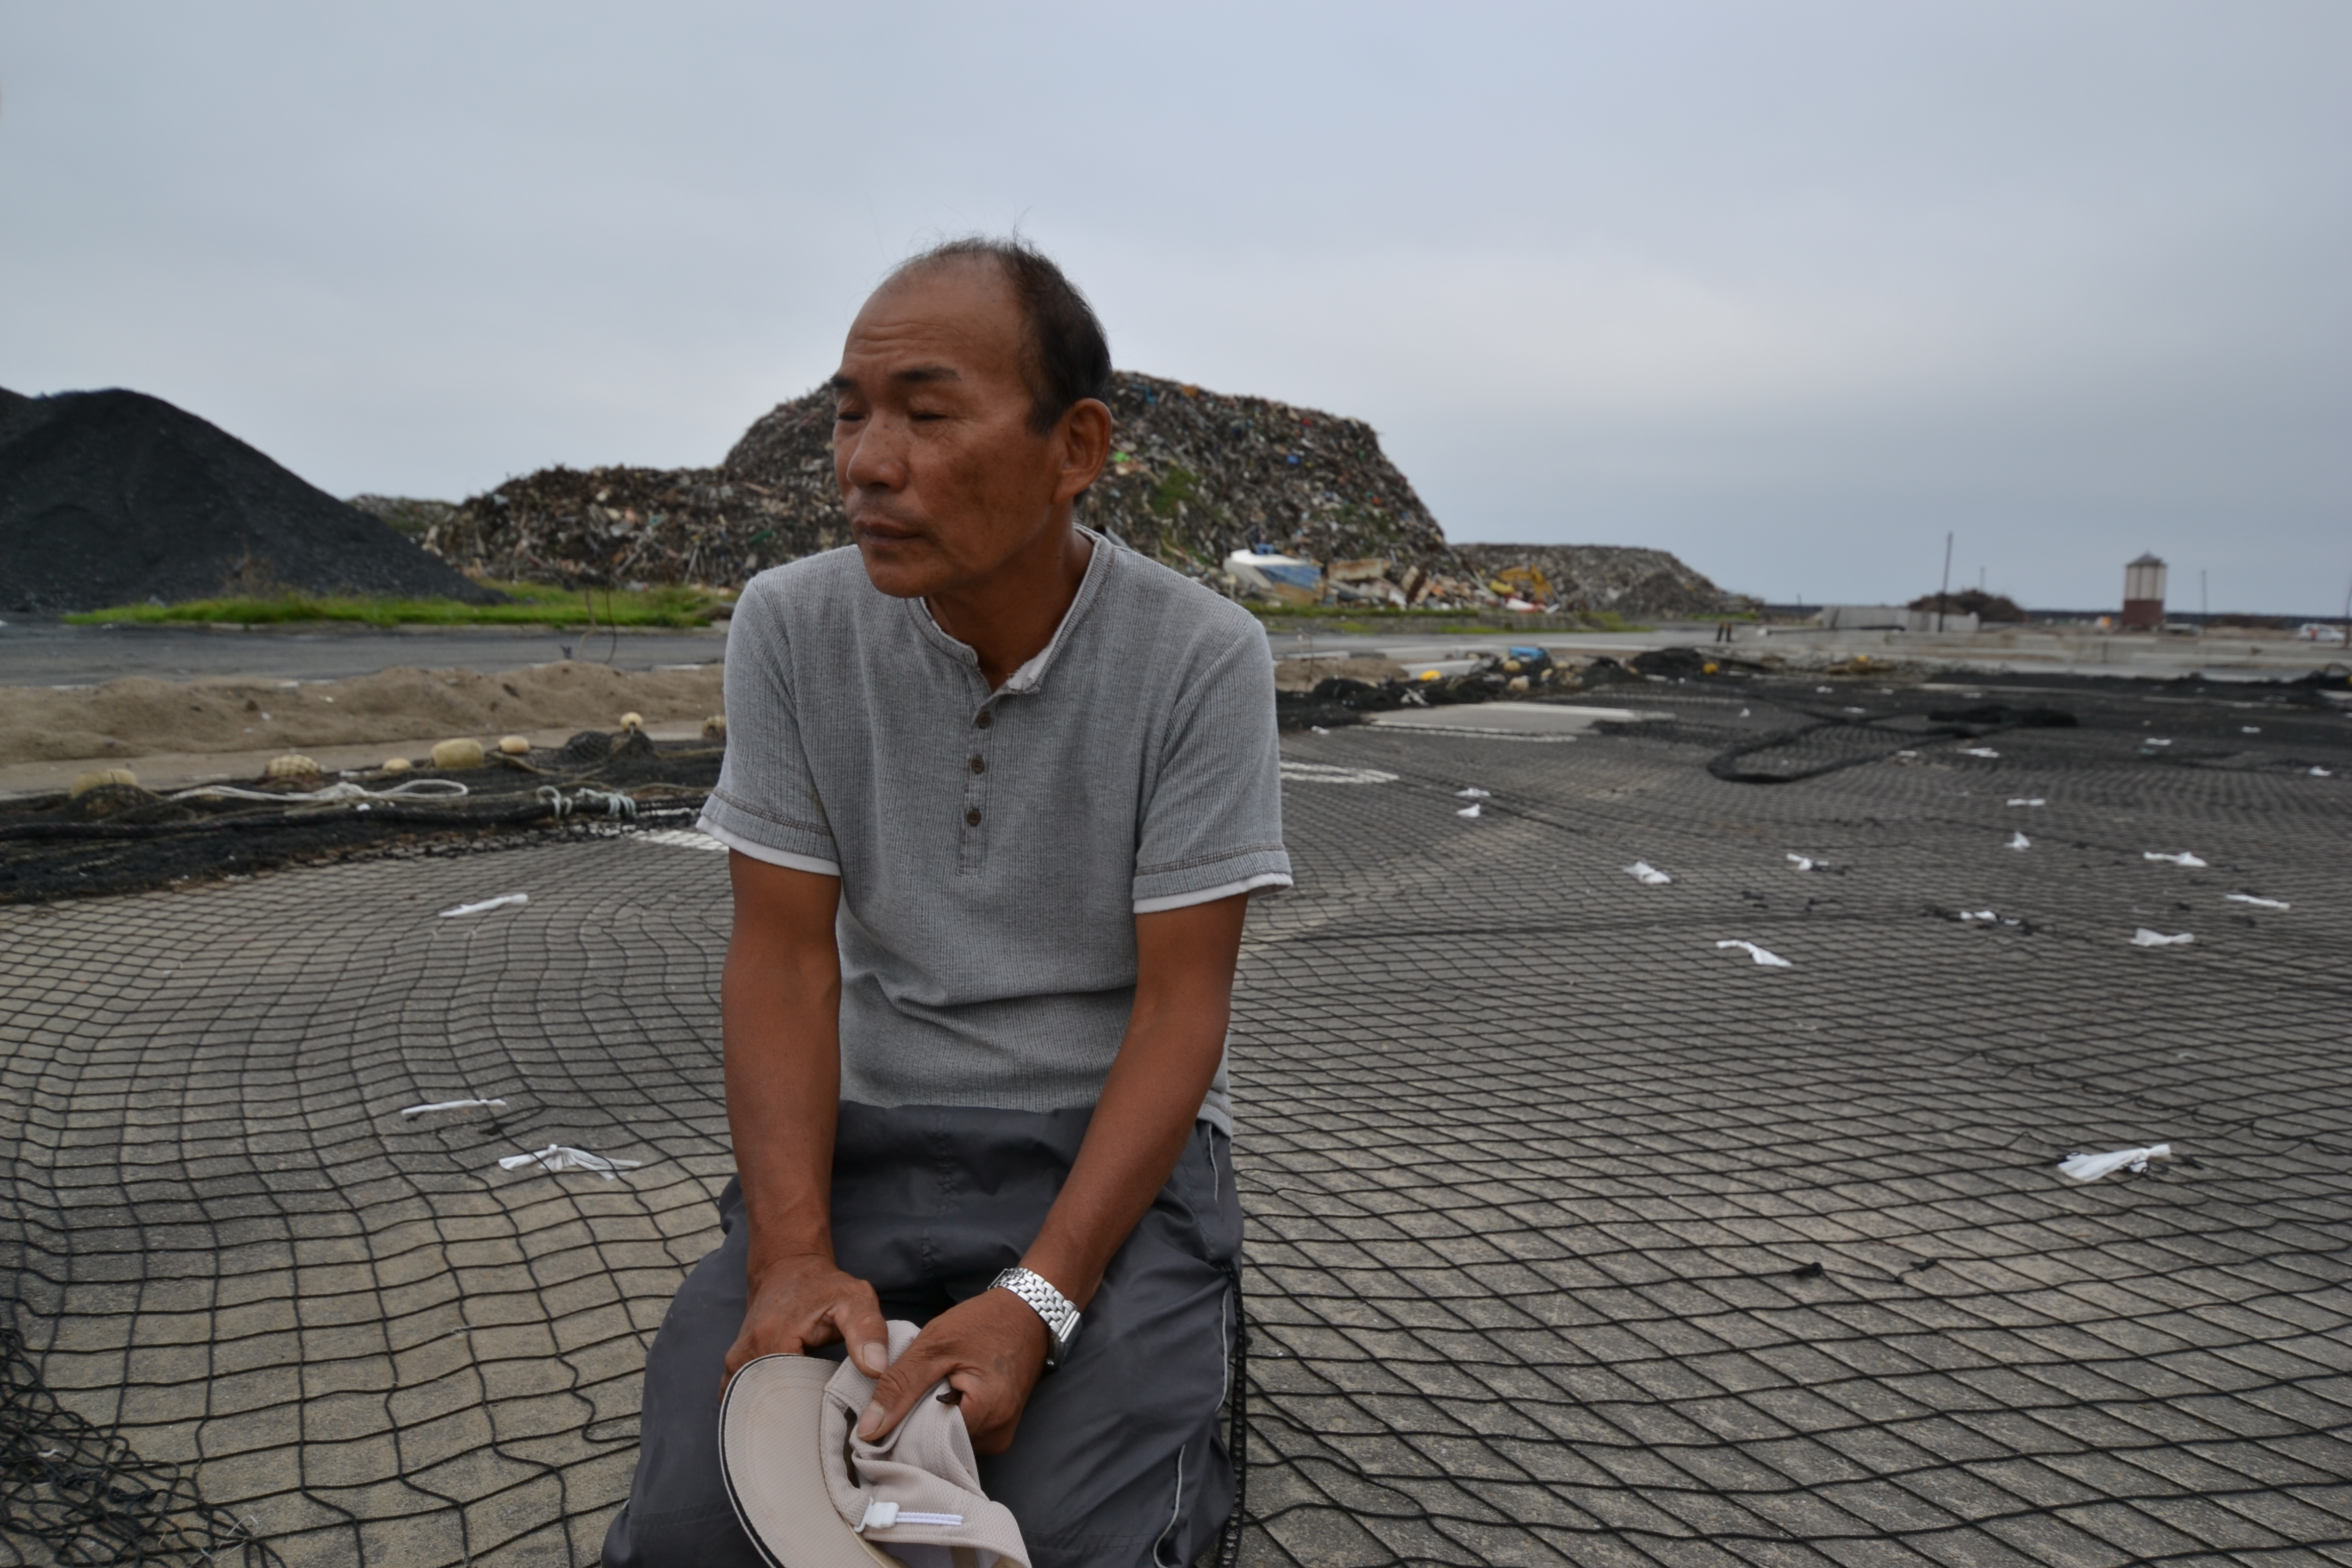 watari mori fisherman on knees eyes closed on broken nets.JPG